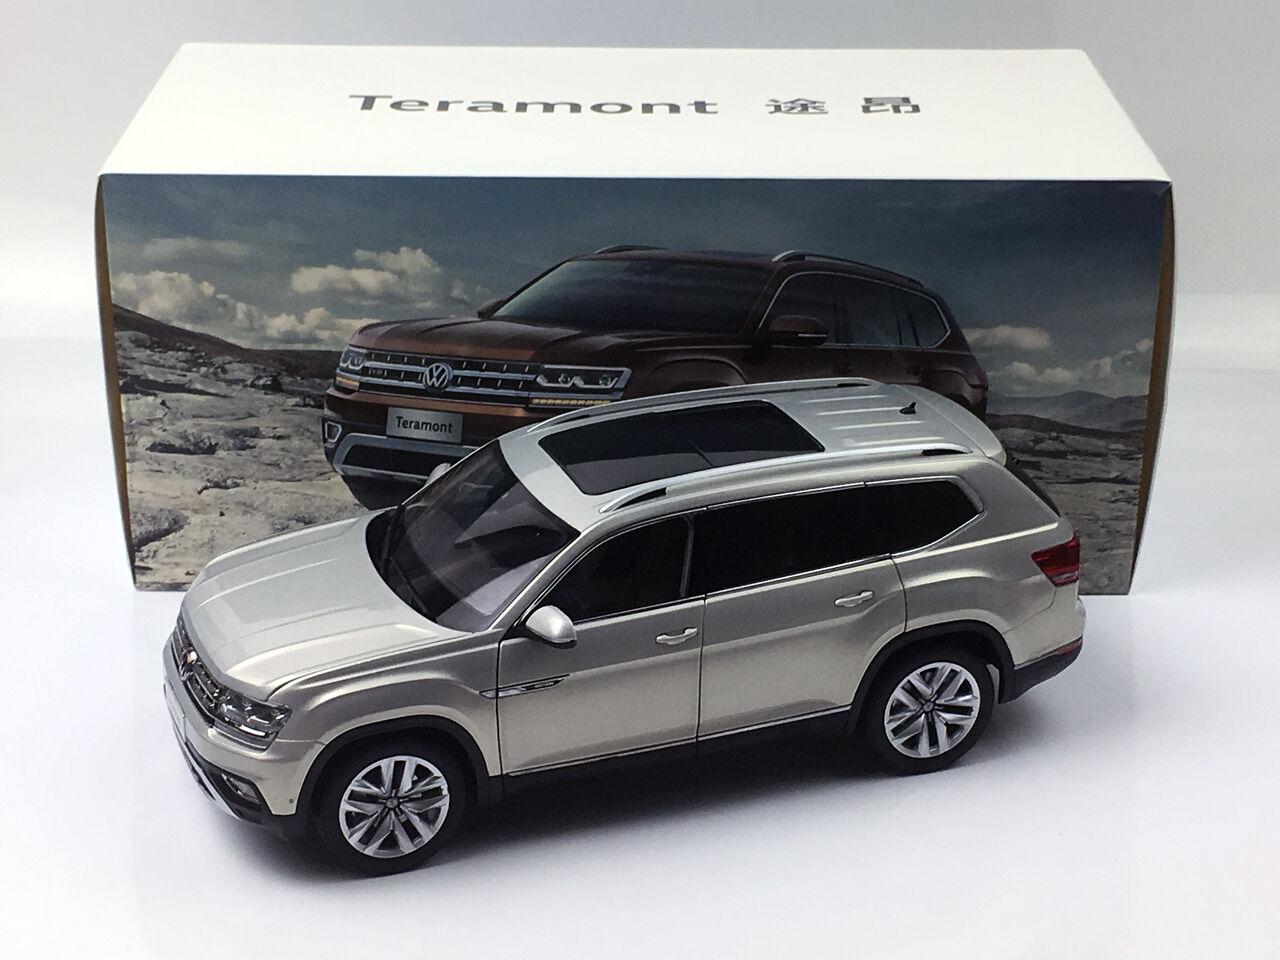 Volkswagen Teramont SUV Plata Metal Fundido Modelo de Coche